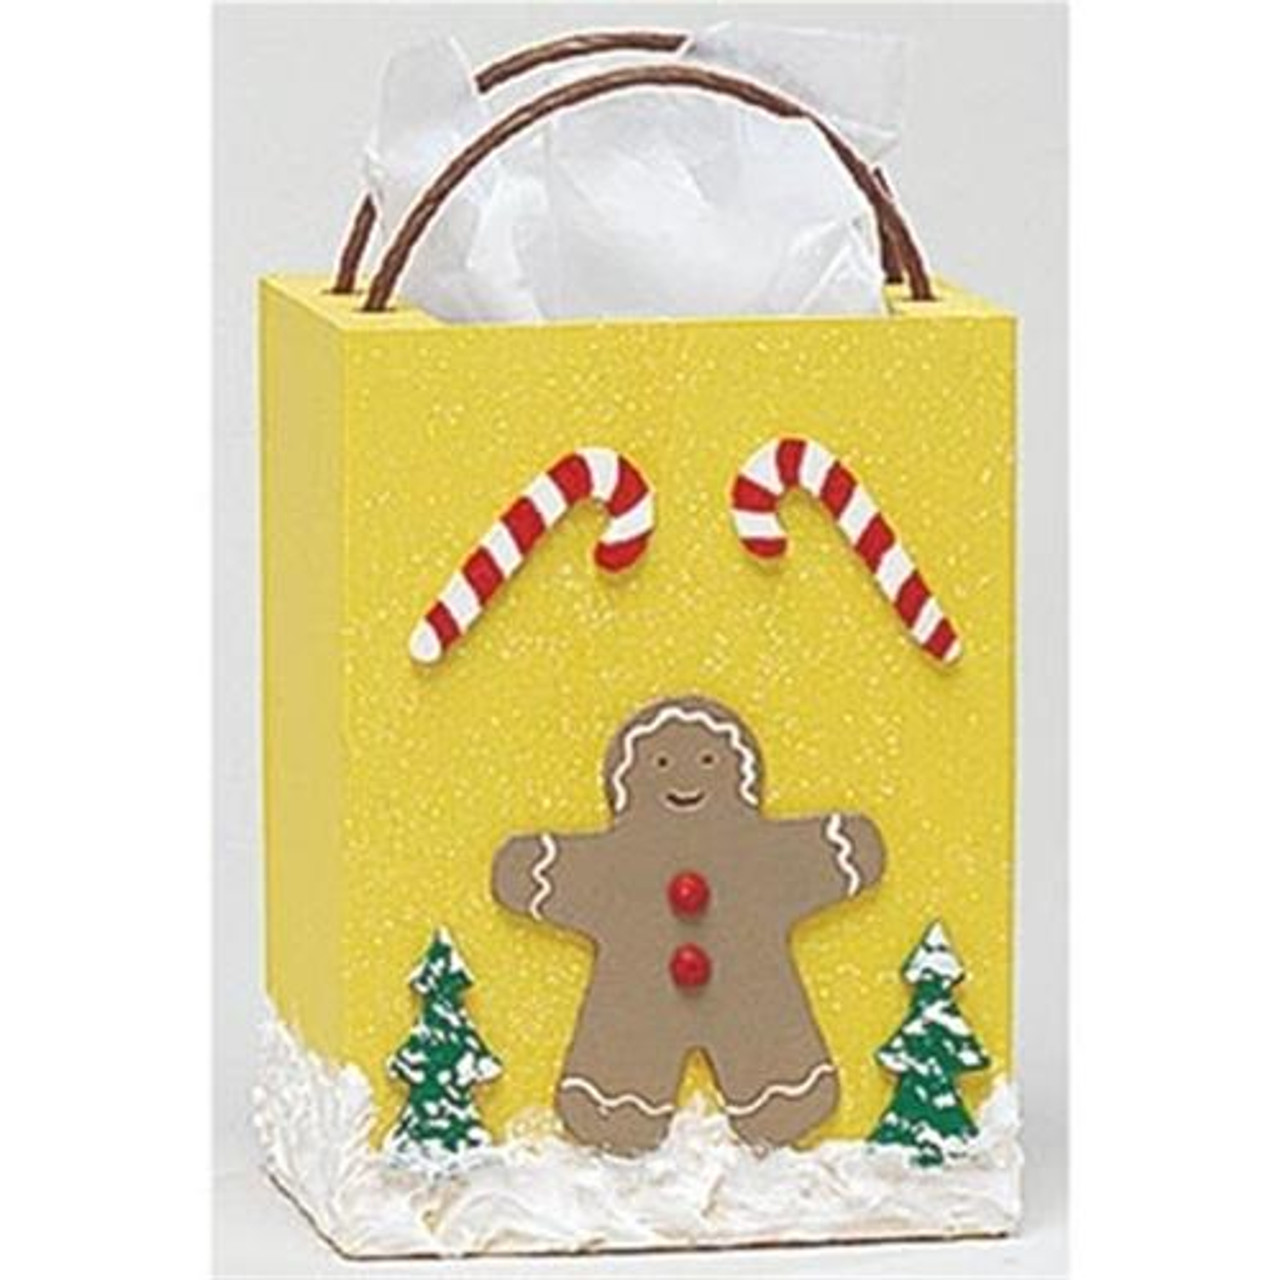 Cherry Tree Toys Small Gingerbread Man Gift Bag Plan